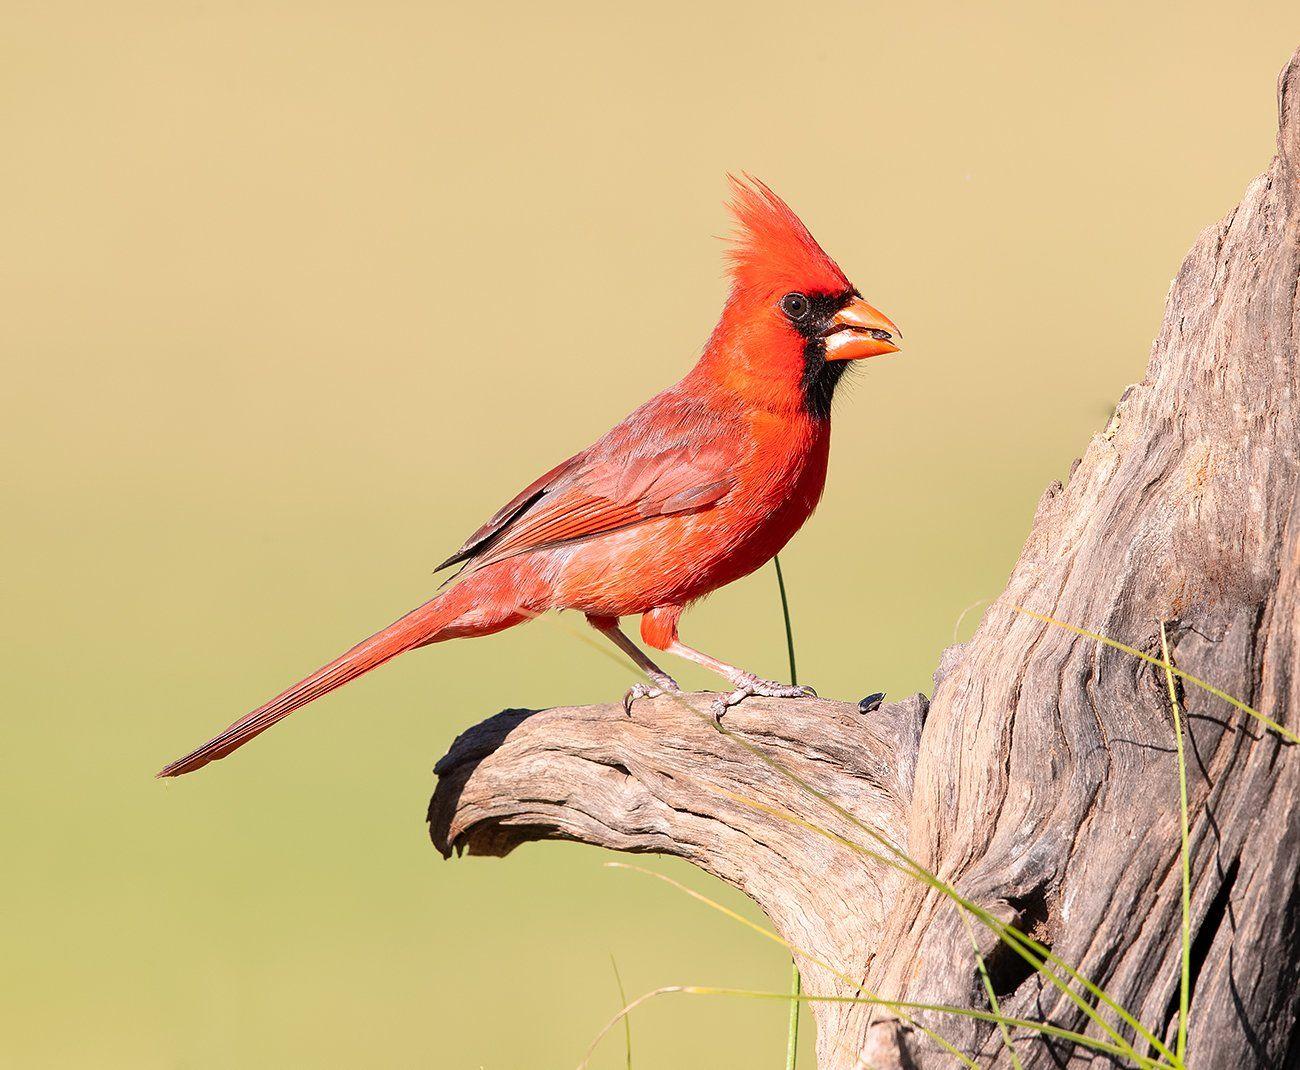 красный кардинал, northern cardinal, cardinal,кардинал, tx, texas, Elizabeth E